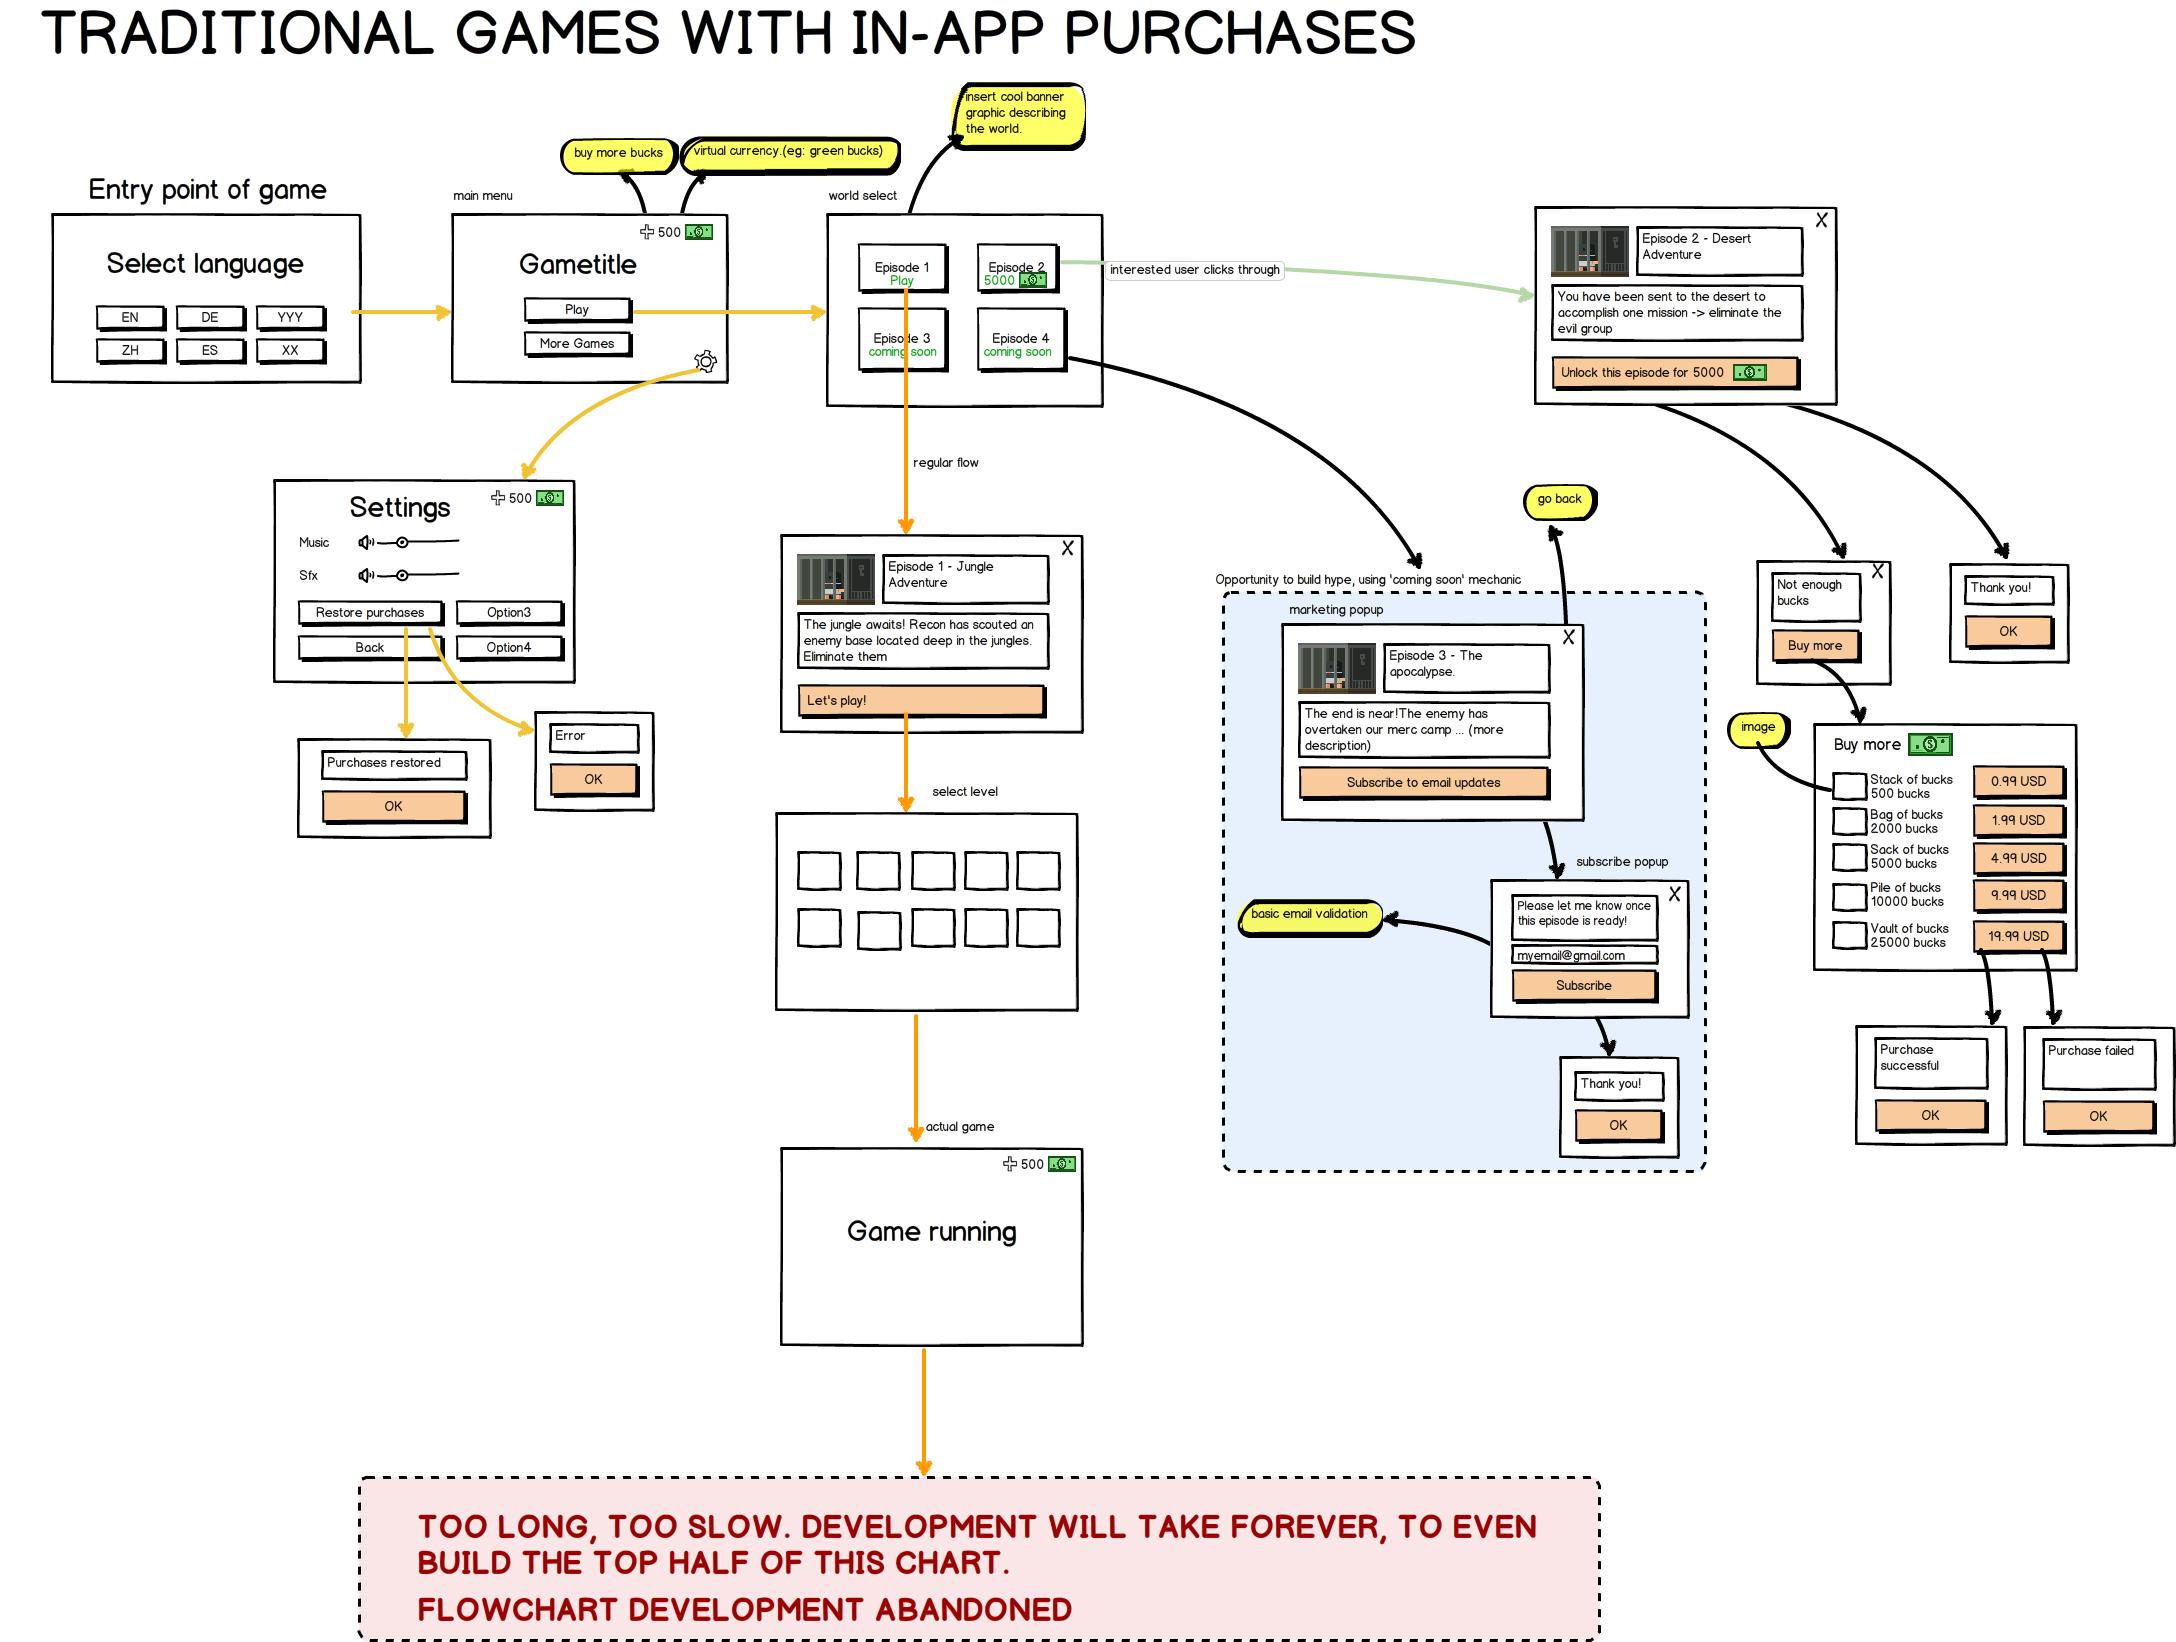 Gamasutra Ben Chongs Blog Game Flow Design Of Traditional - Game flow summary